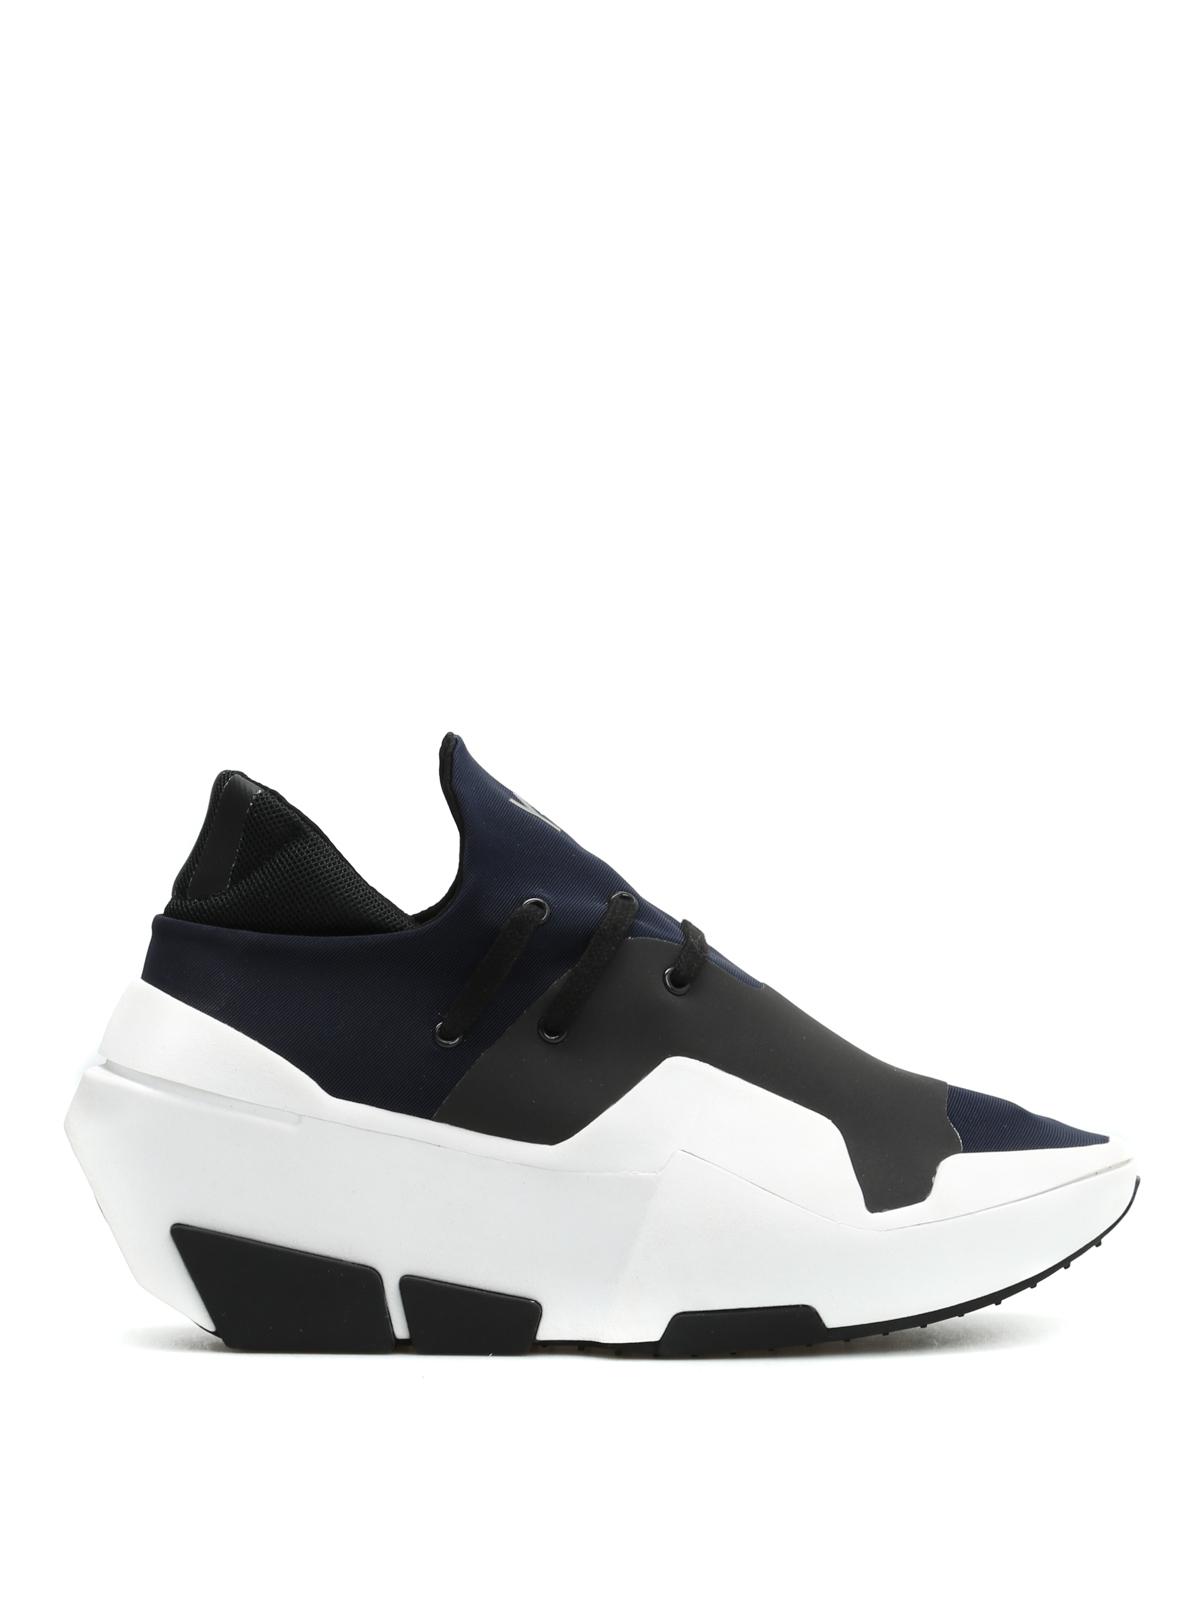 Adidas Y-3 - Mira futuristic sneakers